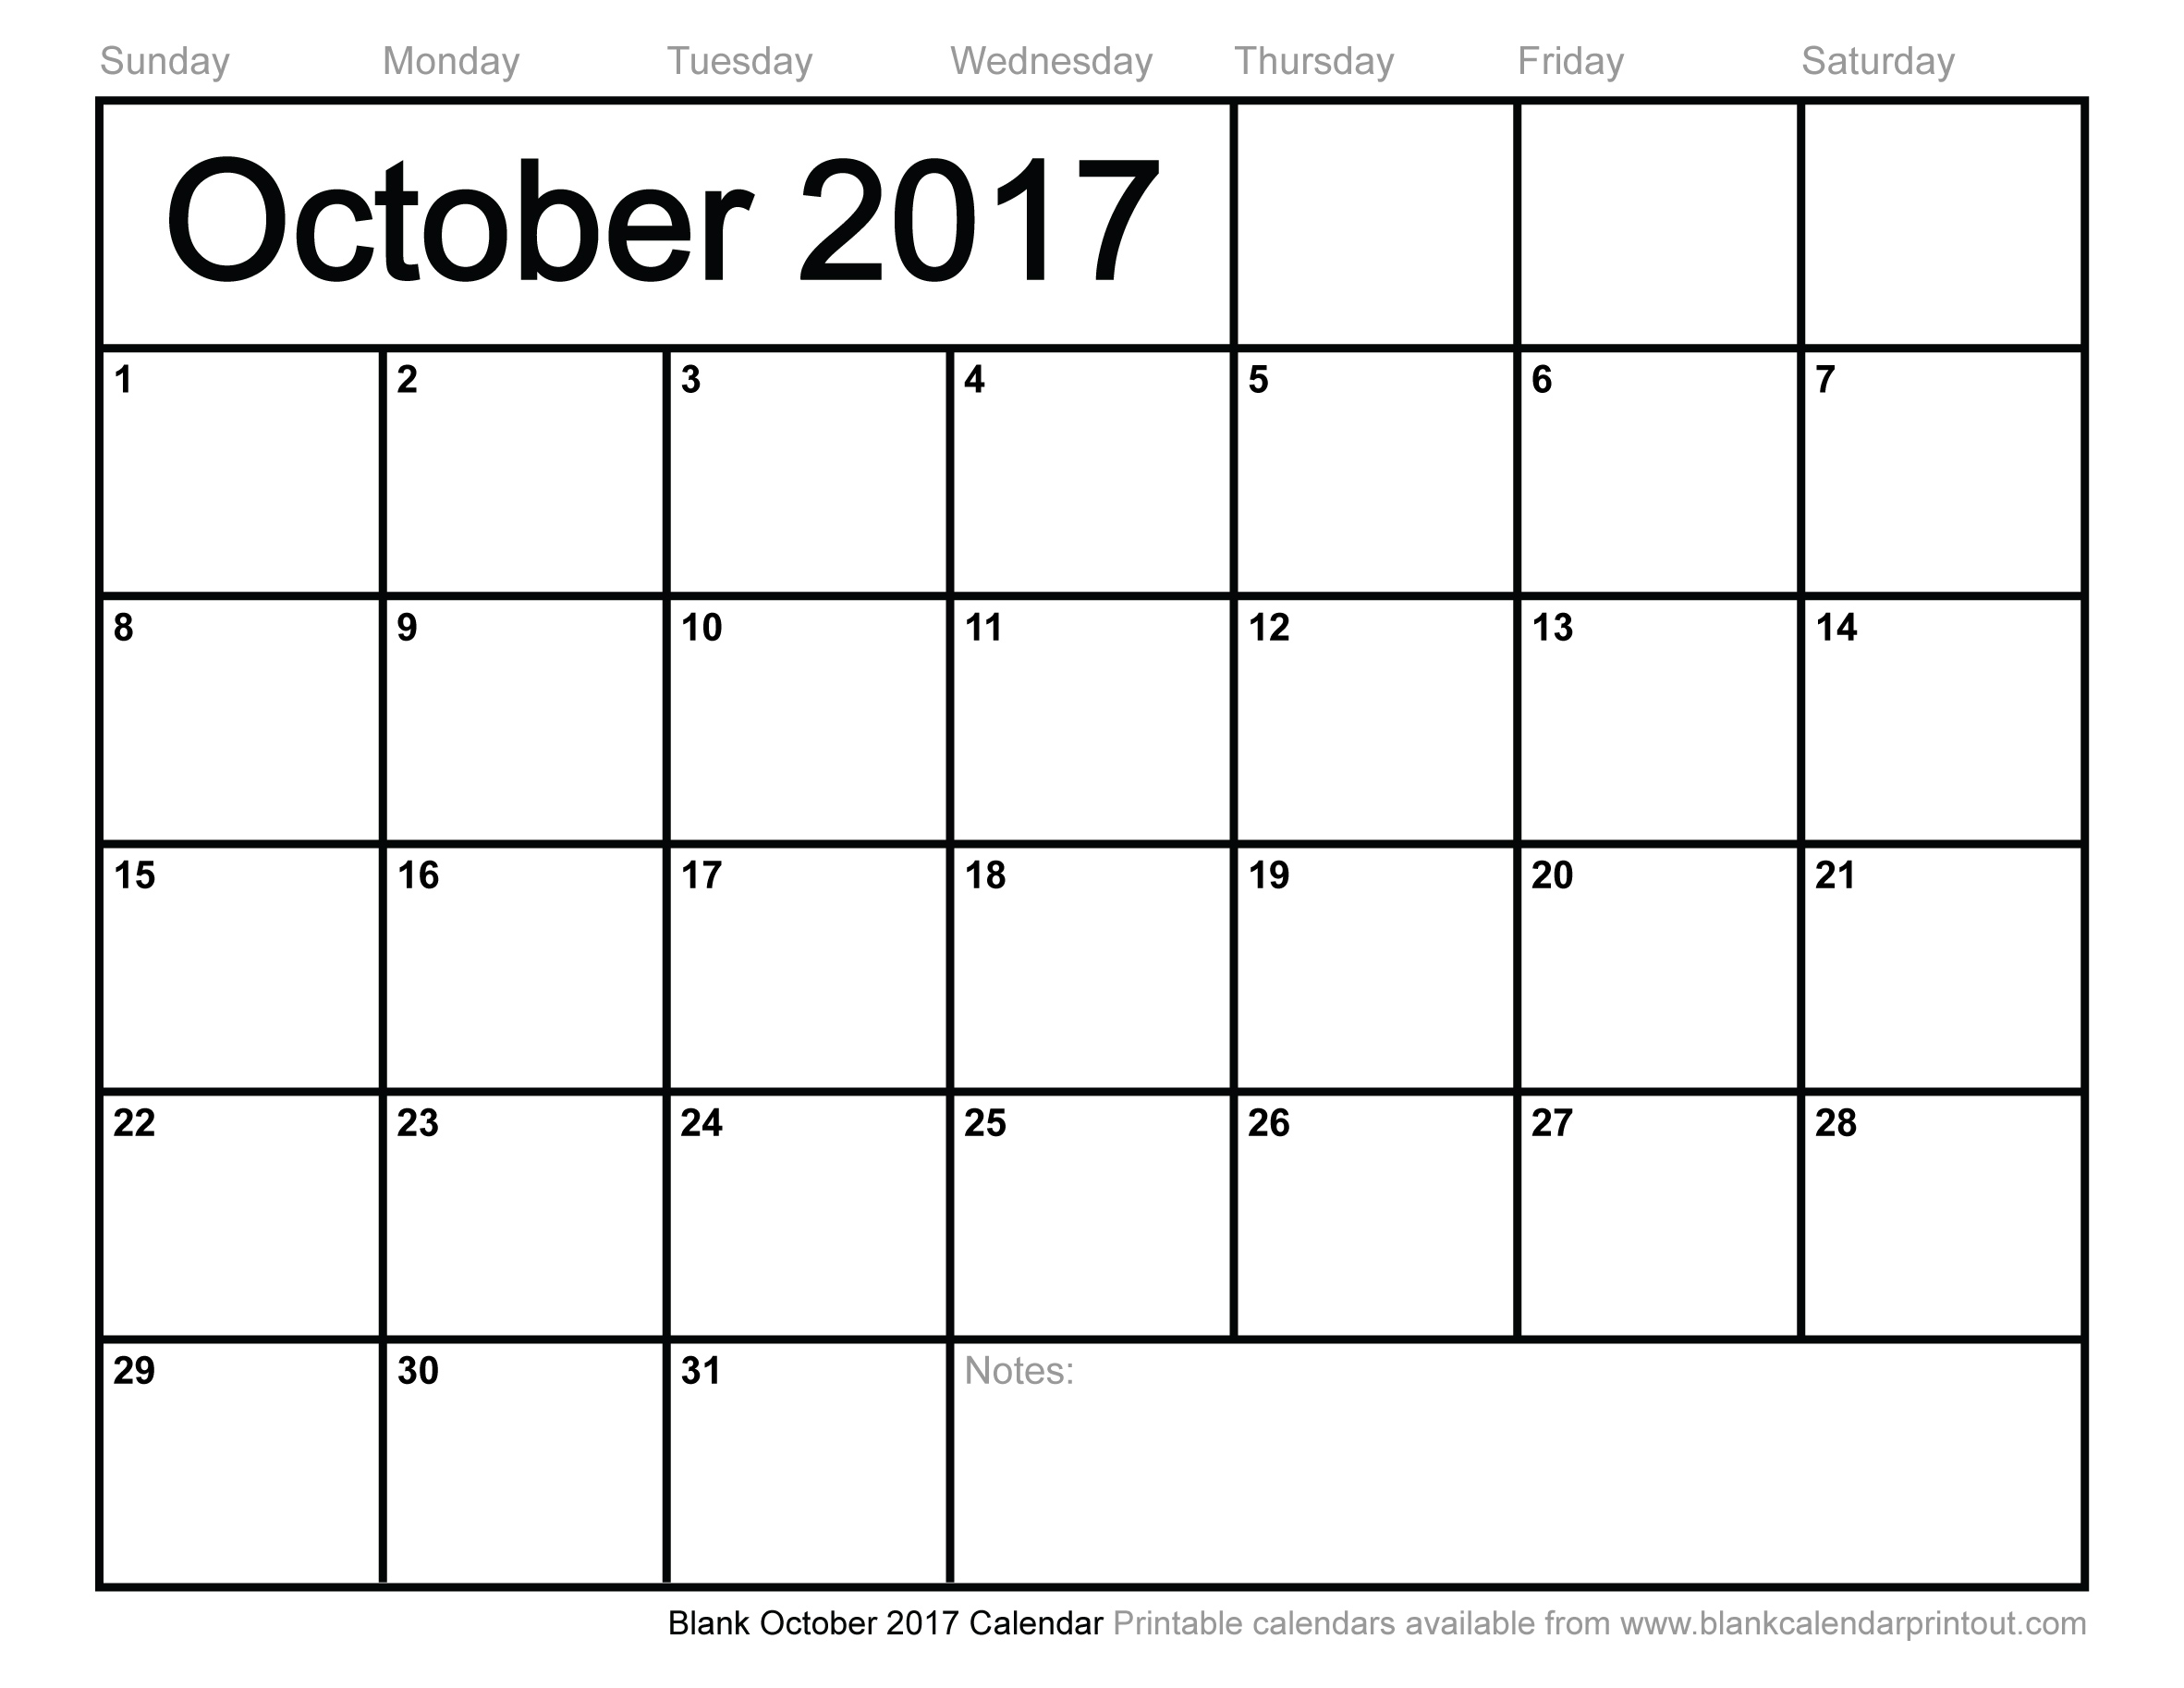 Blank October 2017 Calendar to Print